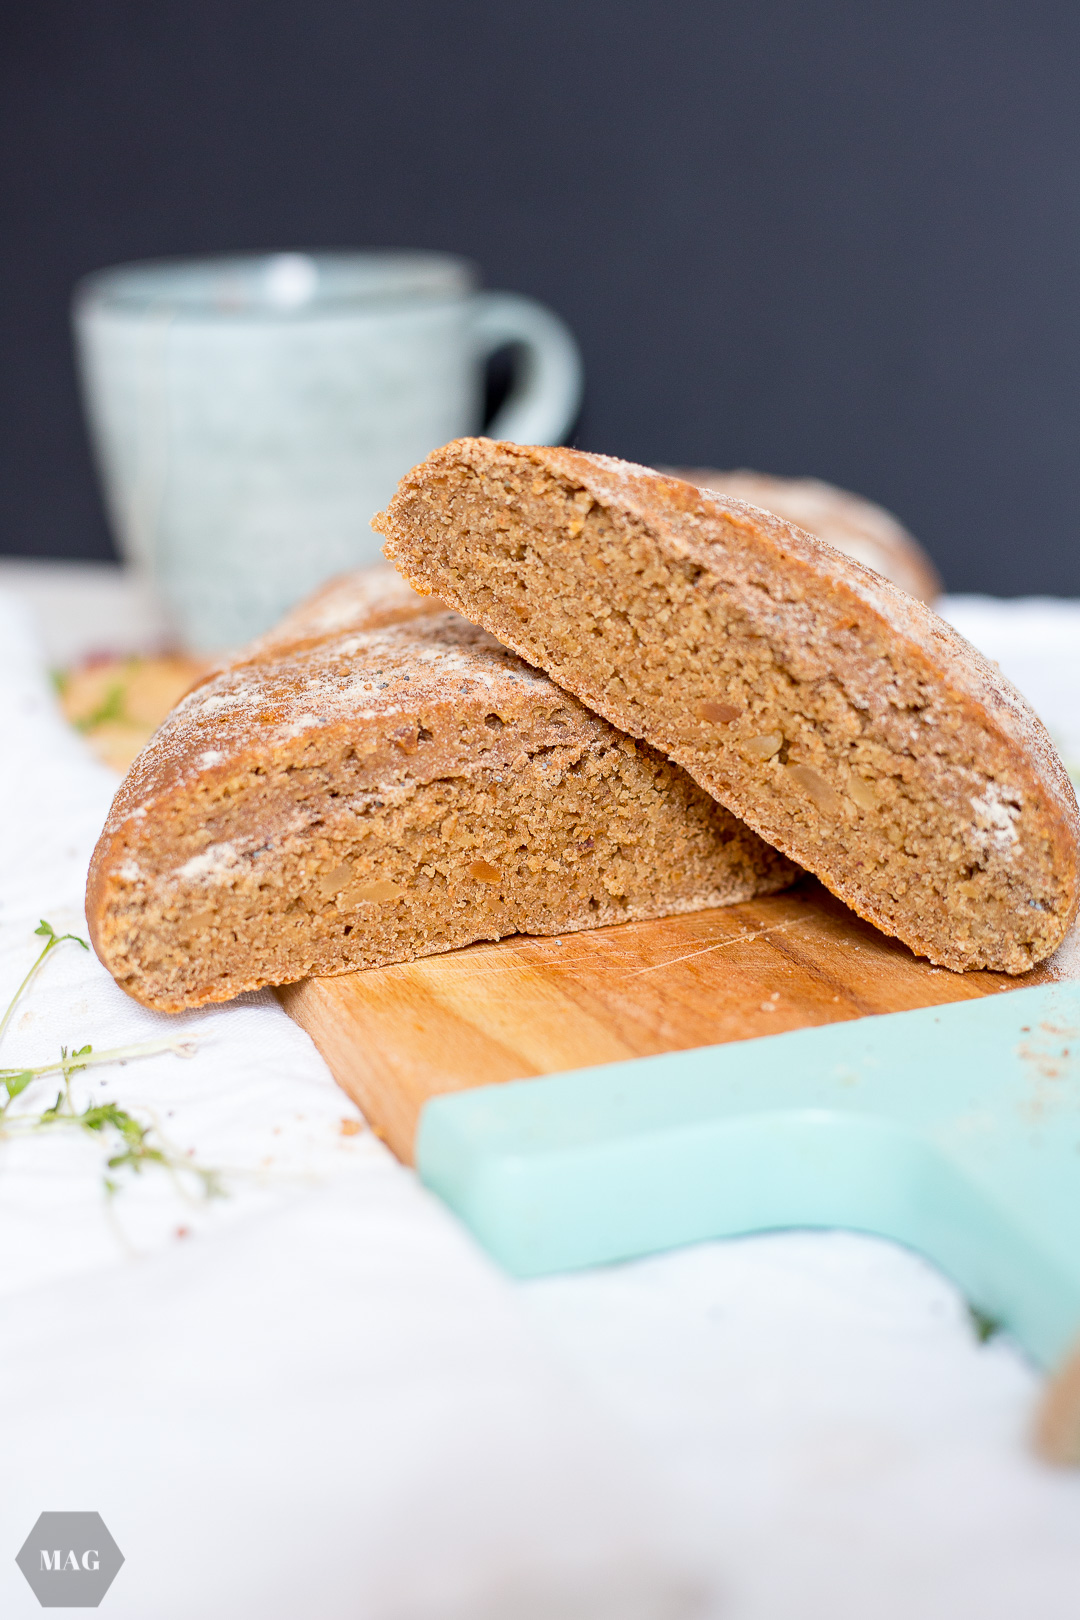 Teffbrot, Nuss-Brot, veganes Nuss-Brot, Nussbrot, veganes Brot, Teffmehl, Teffbrot, Nussbrot mit Teffmehl, Dinkelvollkornbrot, veganes Dinkelbrot, Dinkel-Teff-Brot